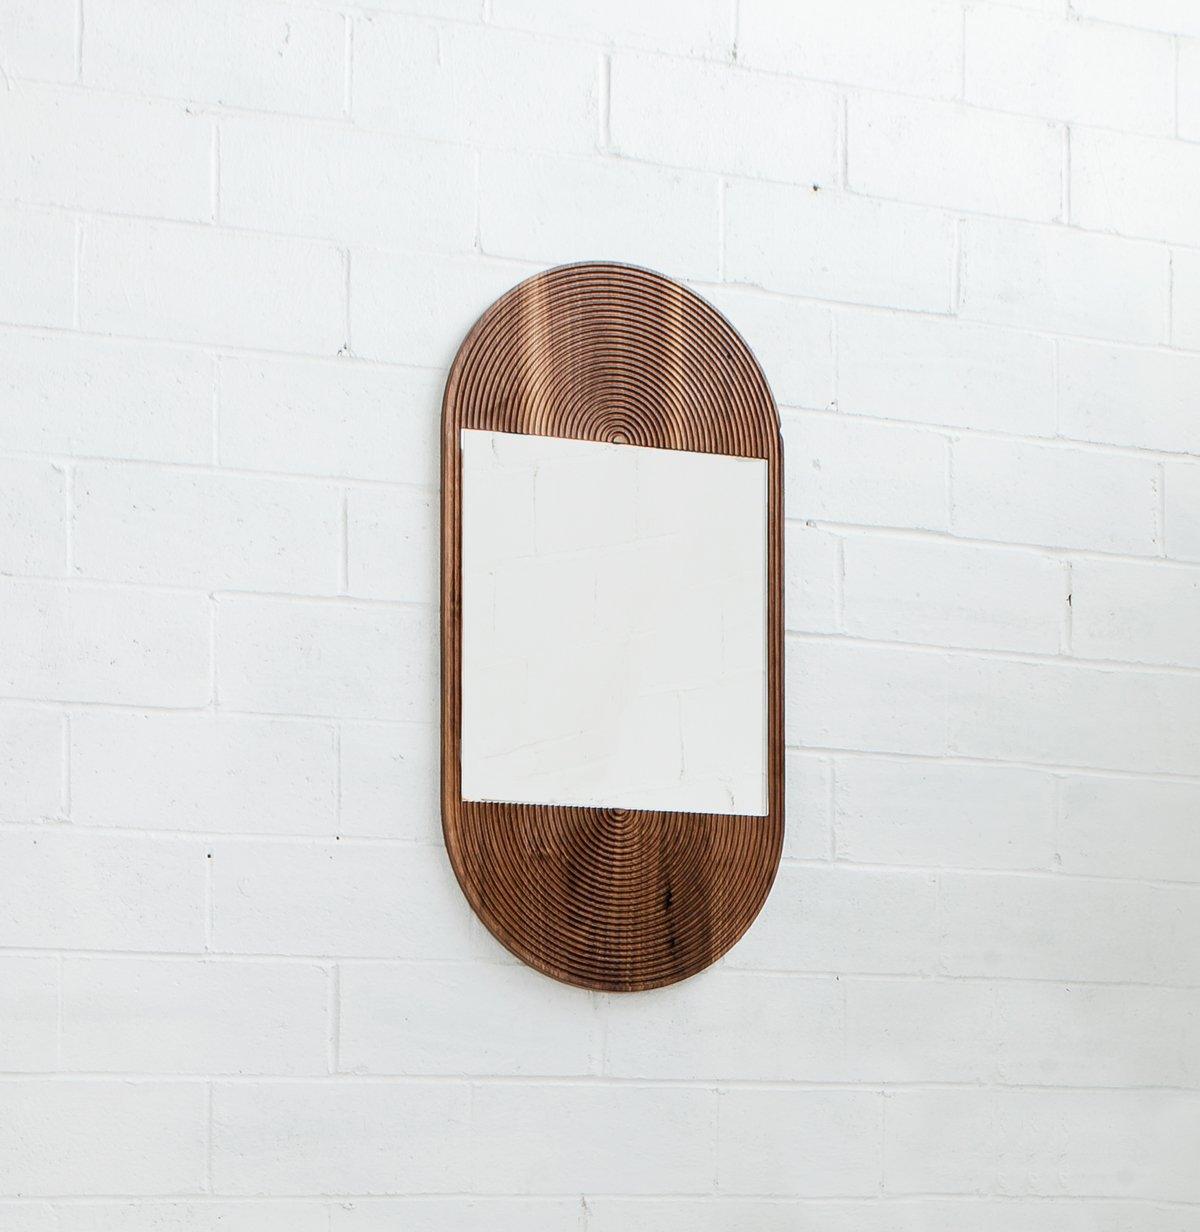 Коллекция мебели от Coil + Drift